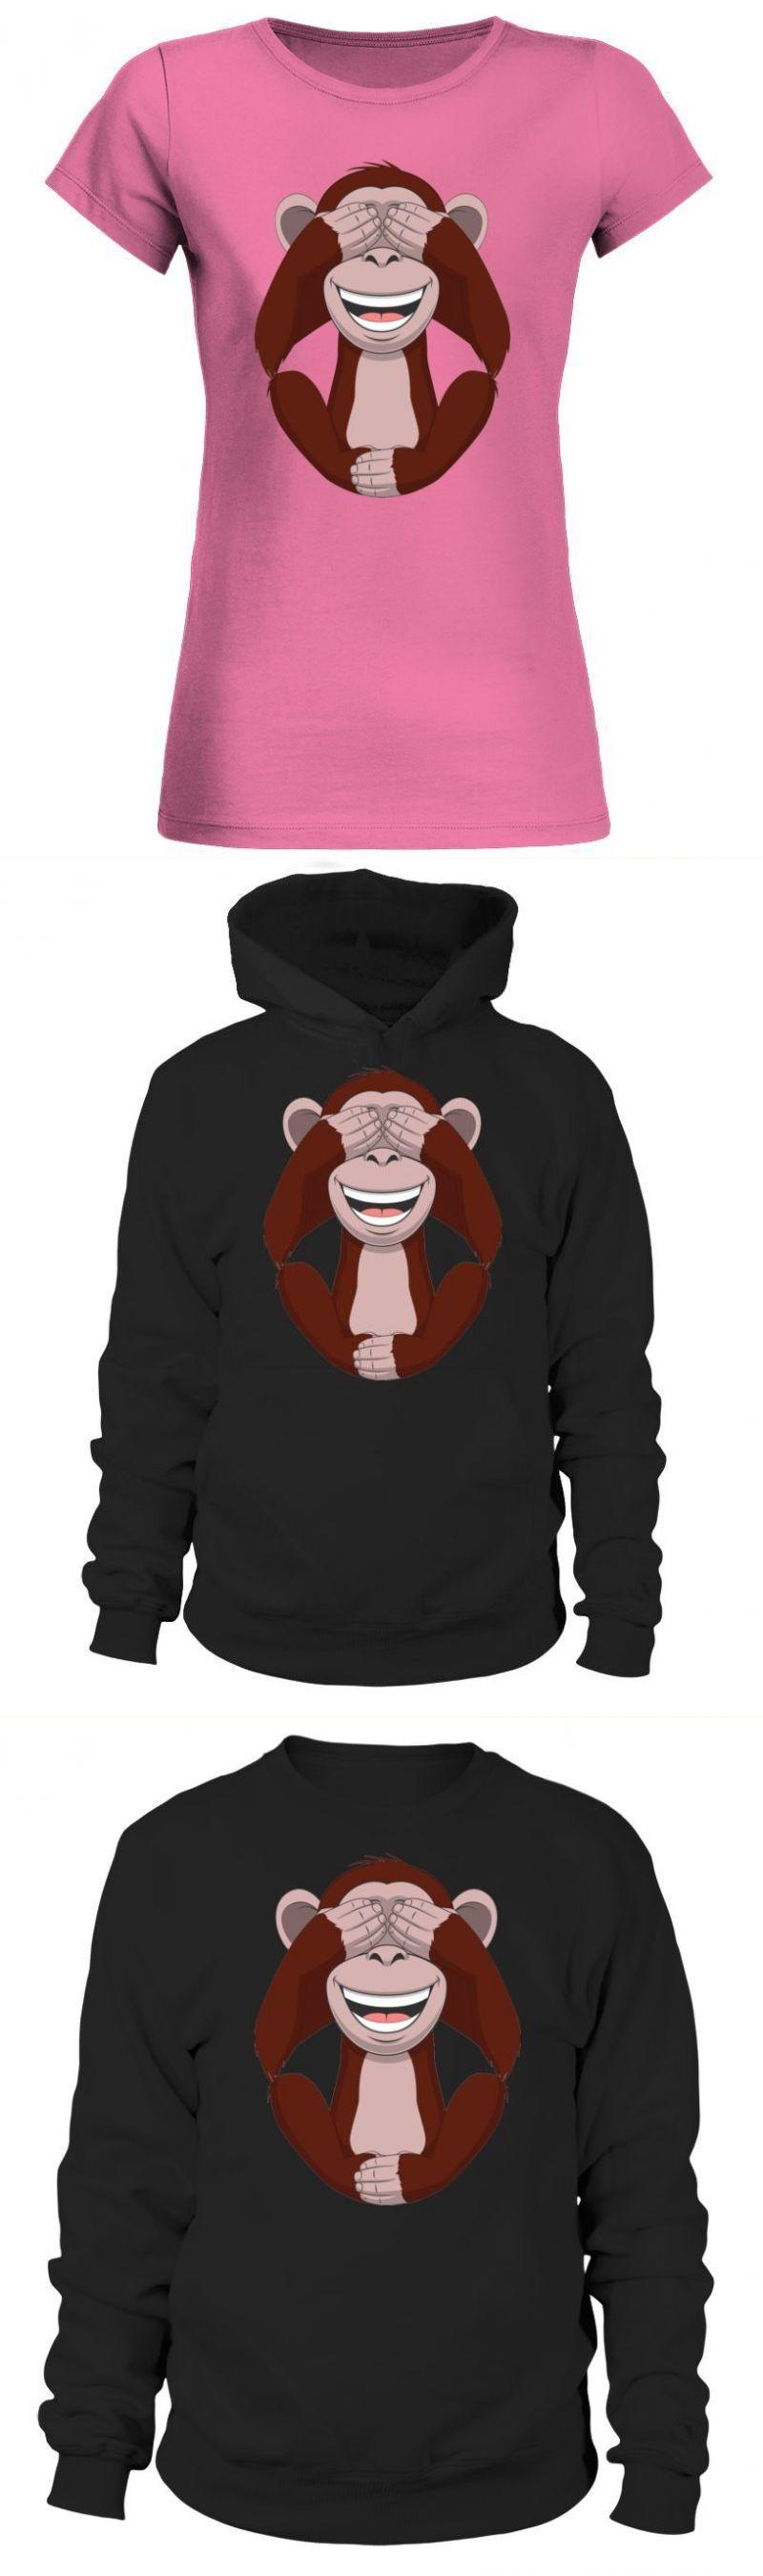 Not my circus not my monkeys t shirt funny little monkey 4 gas monkey garage long sleeve t shirt #gasmonkeygarage Not my circus not my monkeys t shirt funny little monkey 4 gas monkey garage long sleeve t shirt #not #my #circus #monkeys #shirt #funny #little #monkey #gas #garage #long #sleeve #round #neck #t-shirt #woman #hoodie #unisex #sweatshirt #gasmonkeygarage